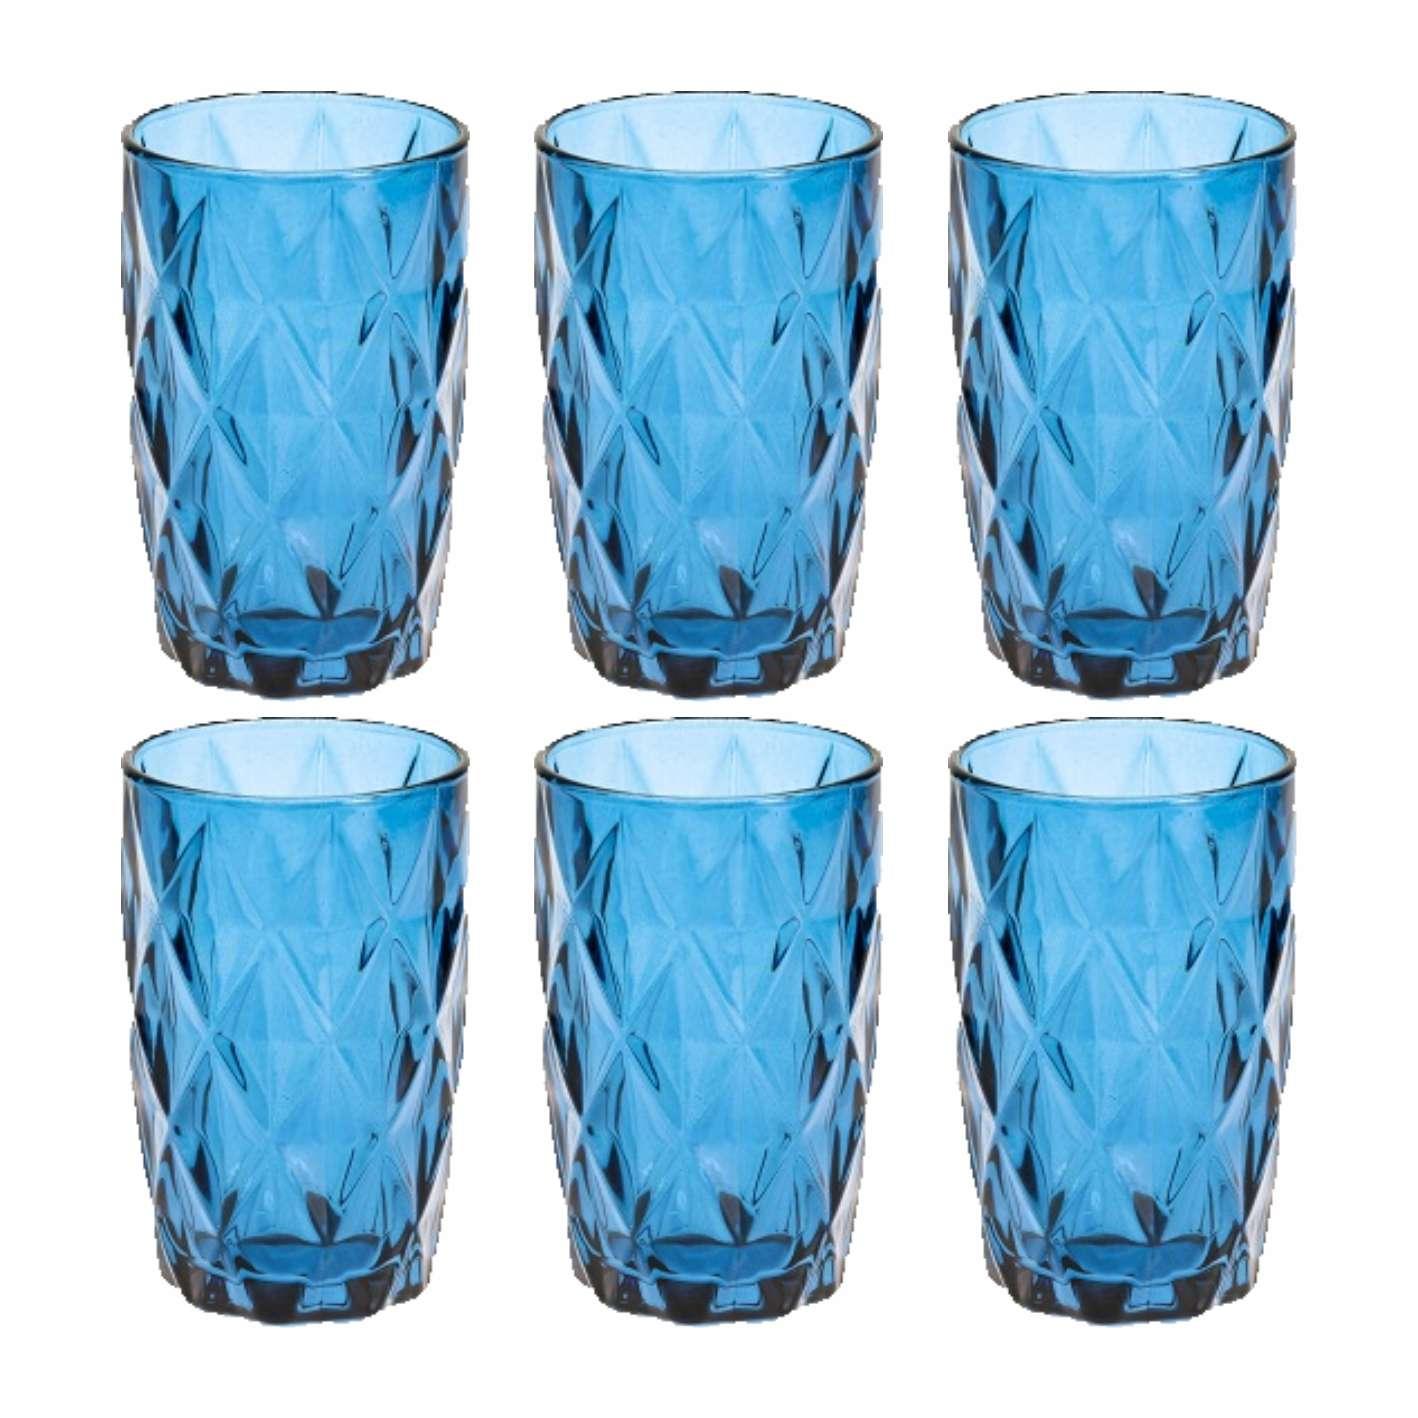 Jogo de 6 copos Diamante Azul 360ml